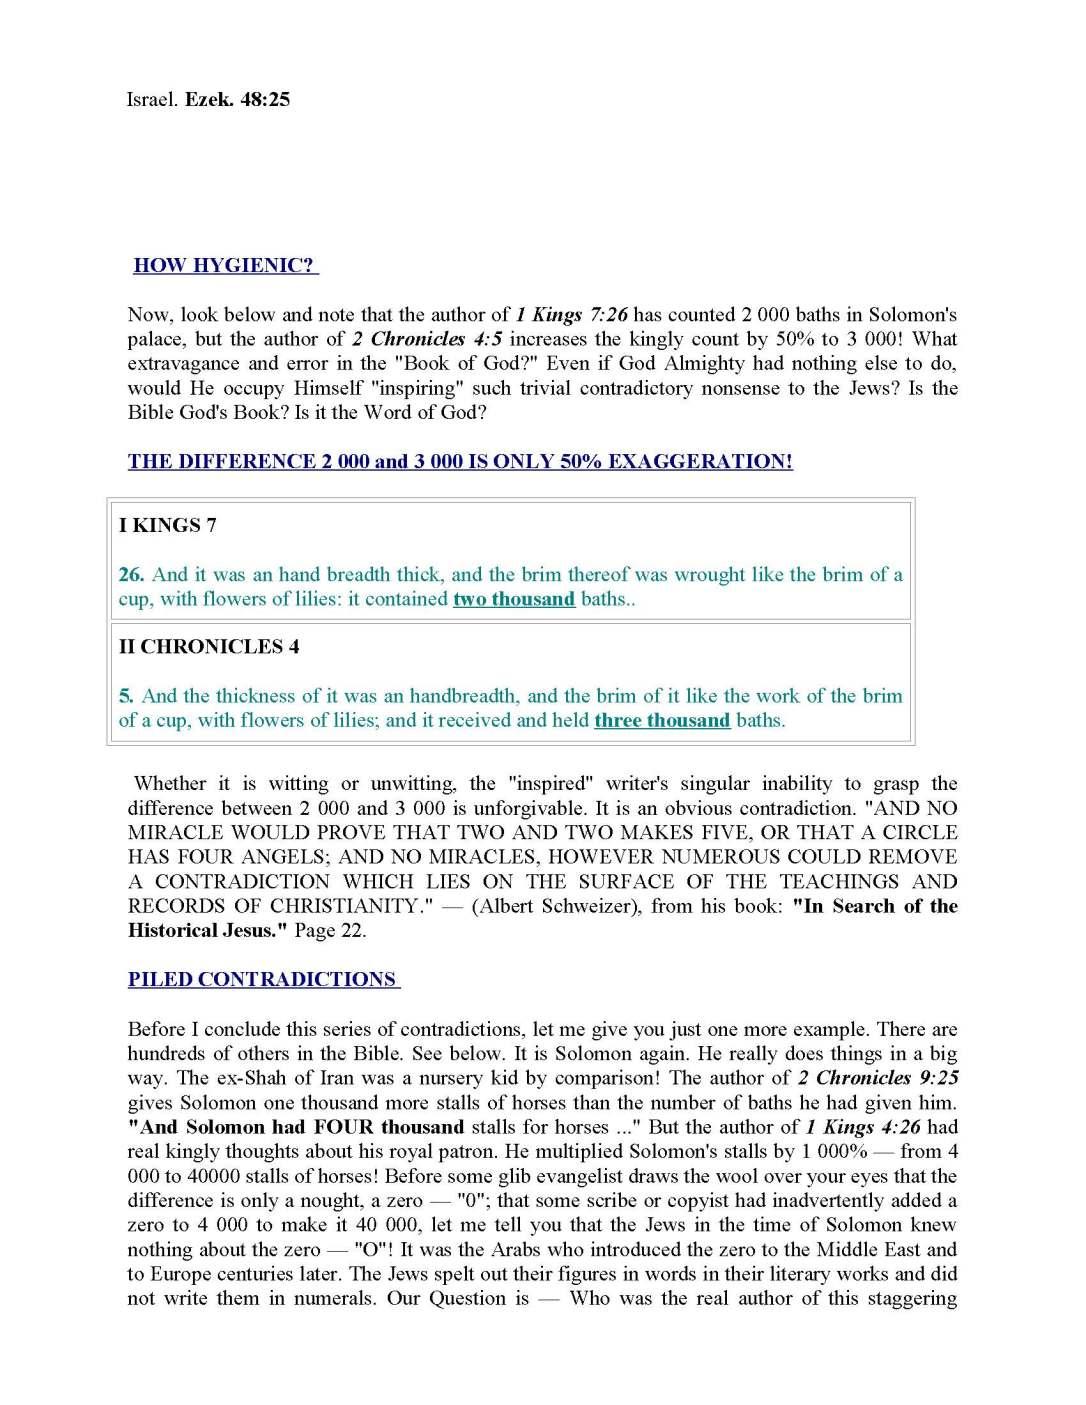 Is The Bible Gods Word [deedat]_Page_32